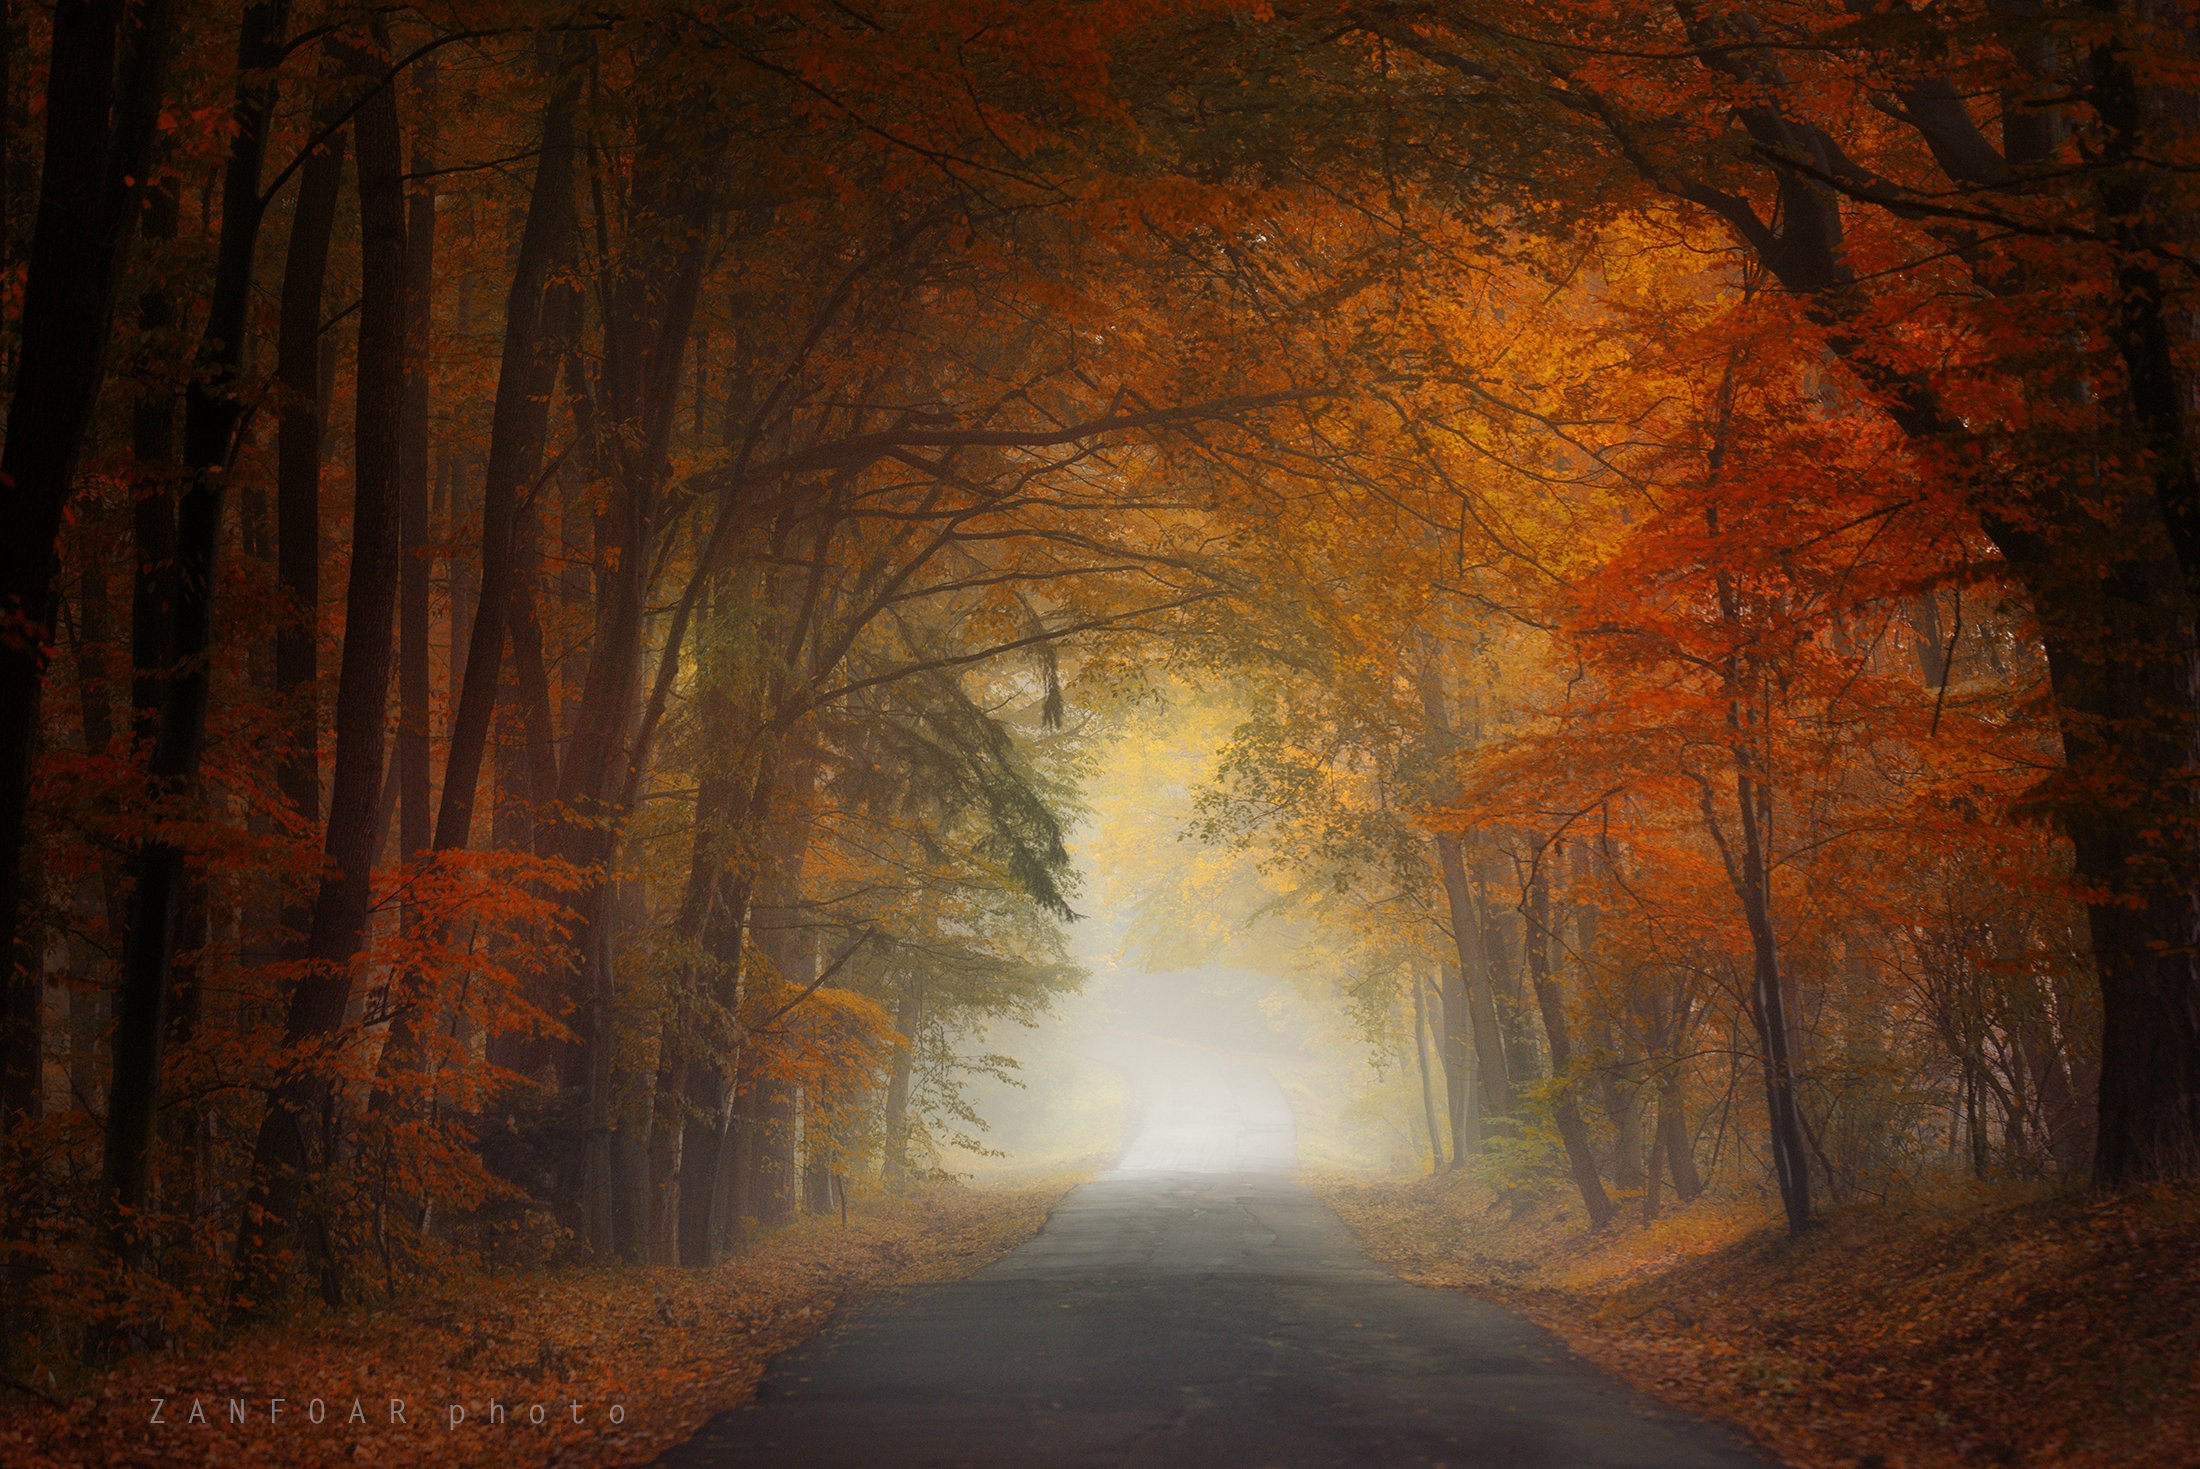 магия осени,магия ,осень, дорога, листья, краски осени, nikon d750, zanfoar, чехия,чешская республика, Zanfoar